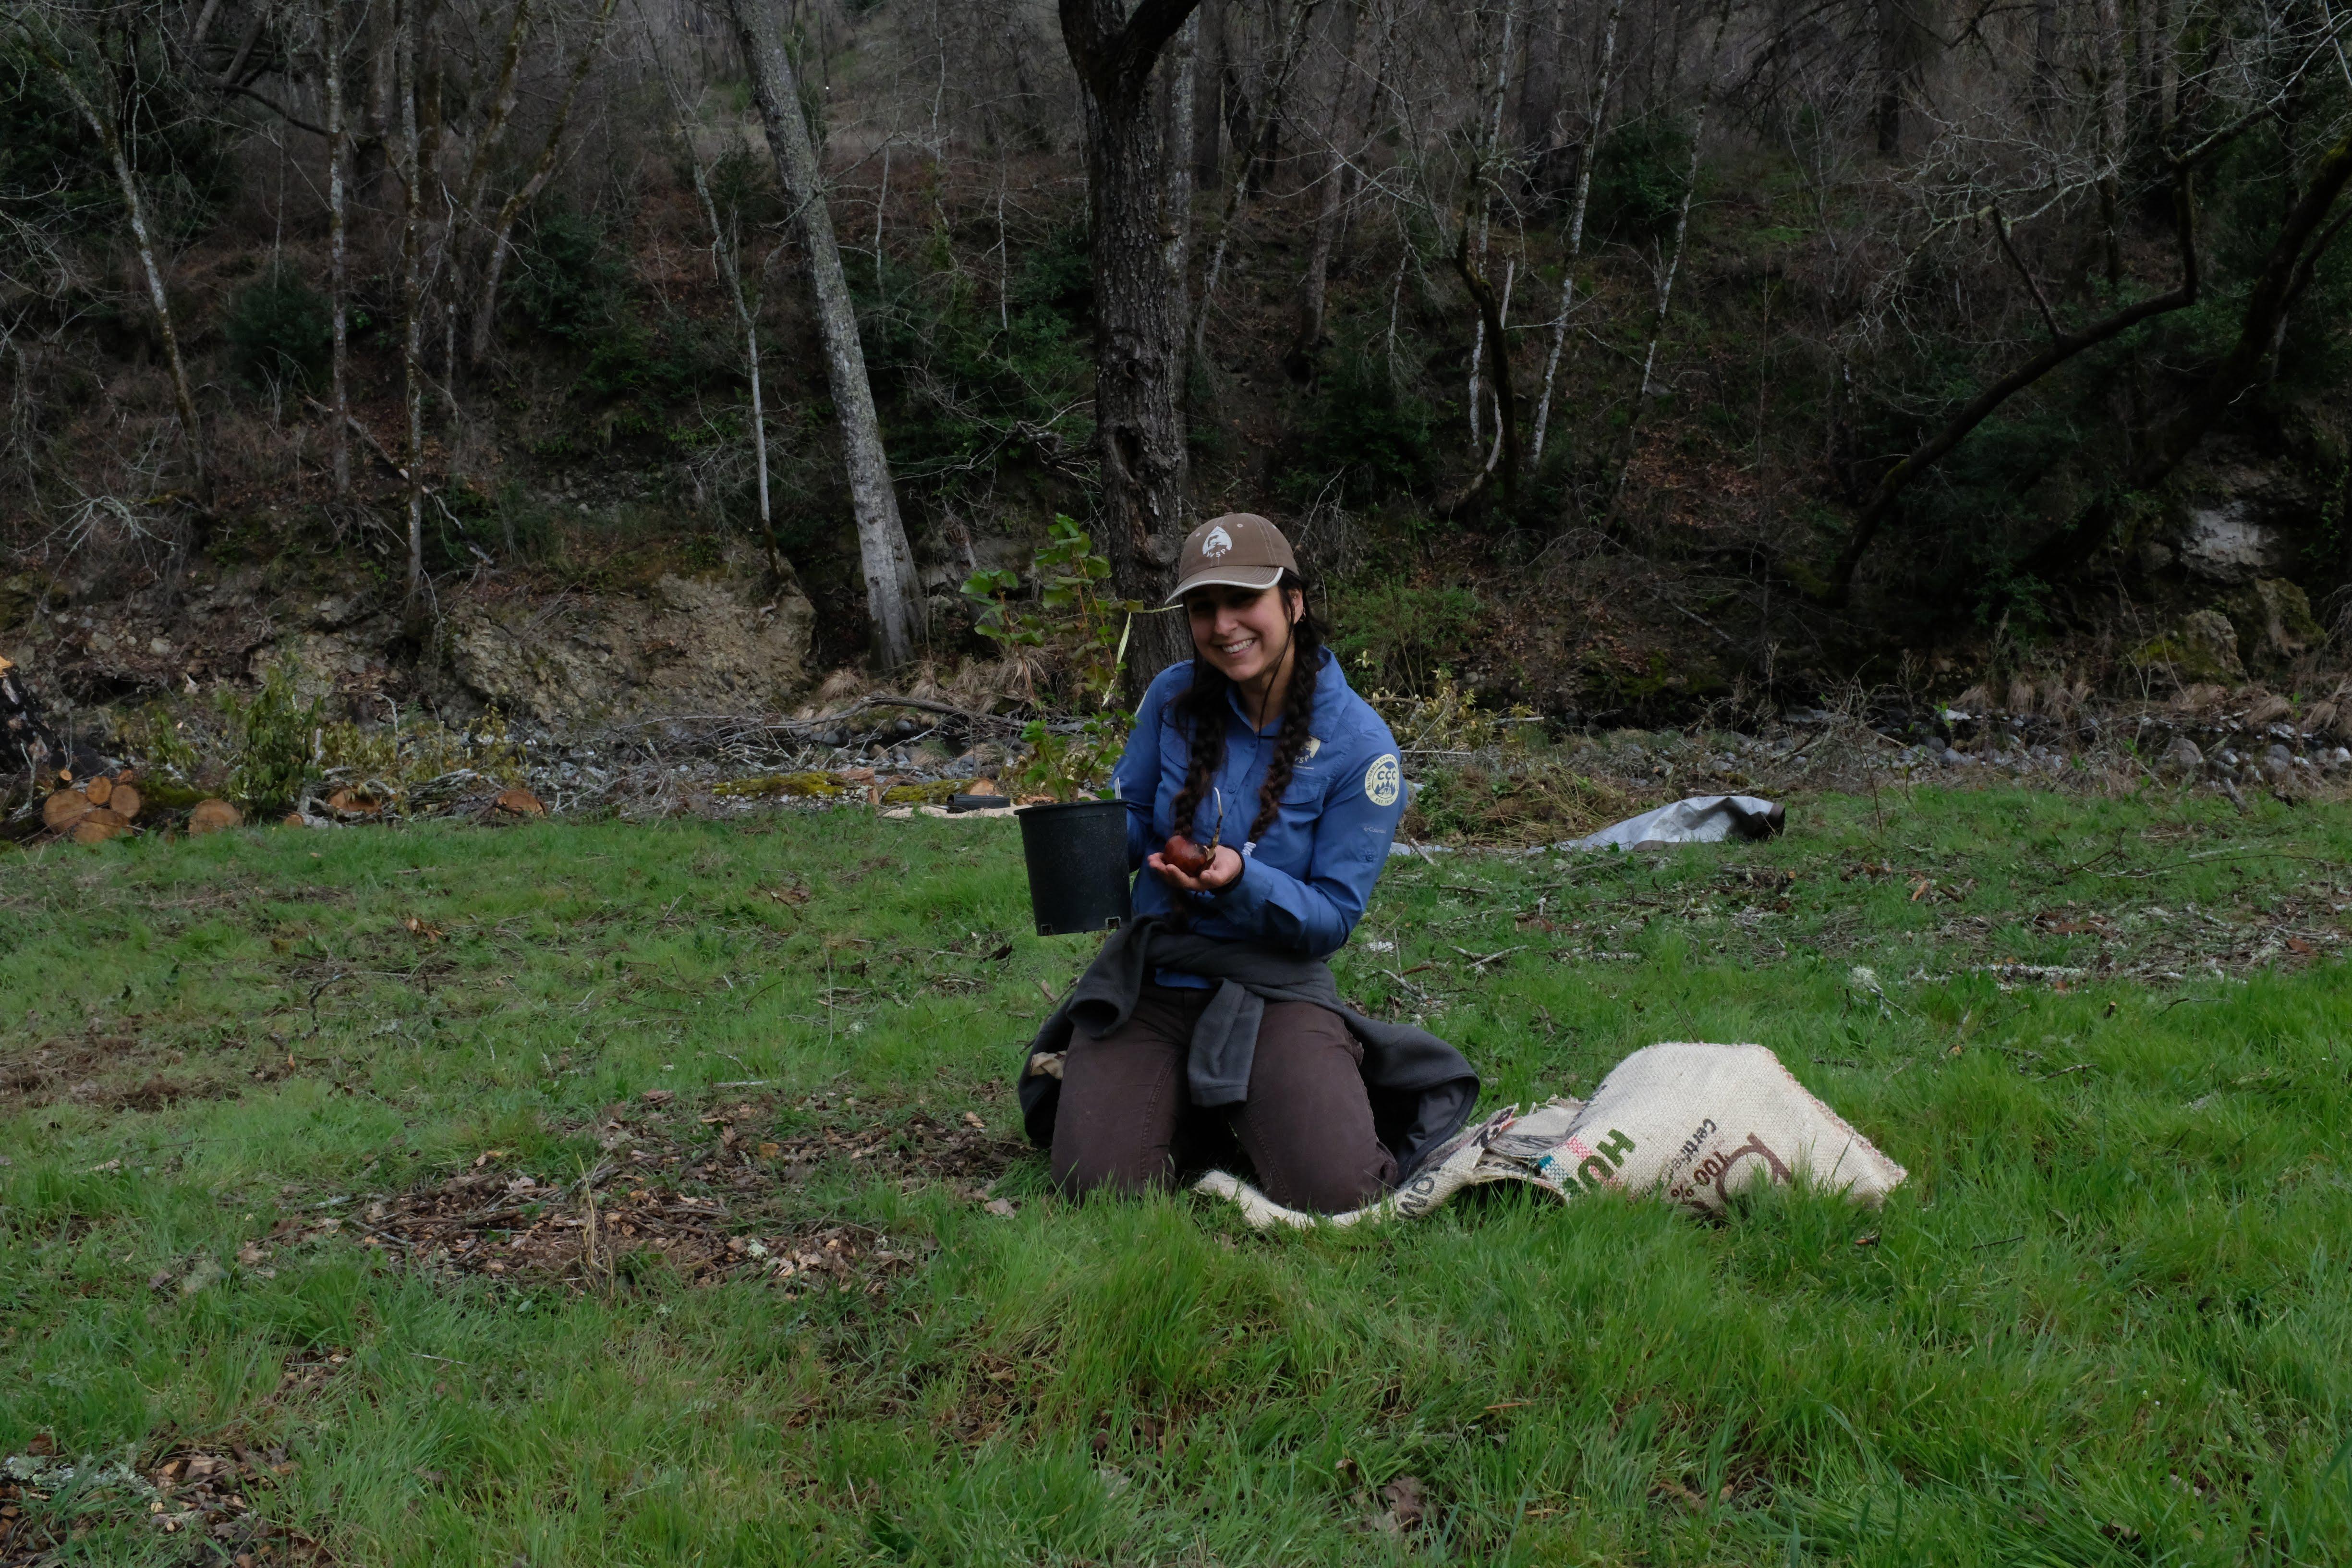 WSP member Shayda Abidi demonstrates how to plant California buckeye seeds and seedlings